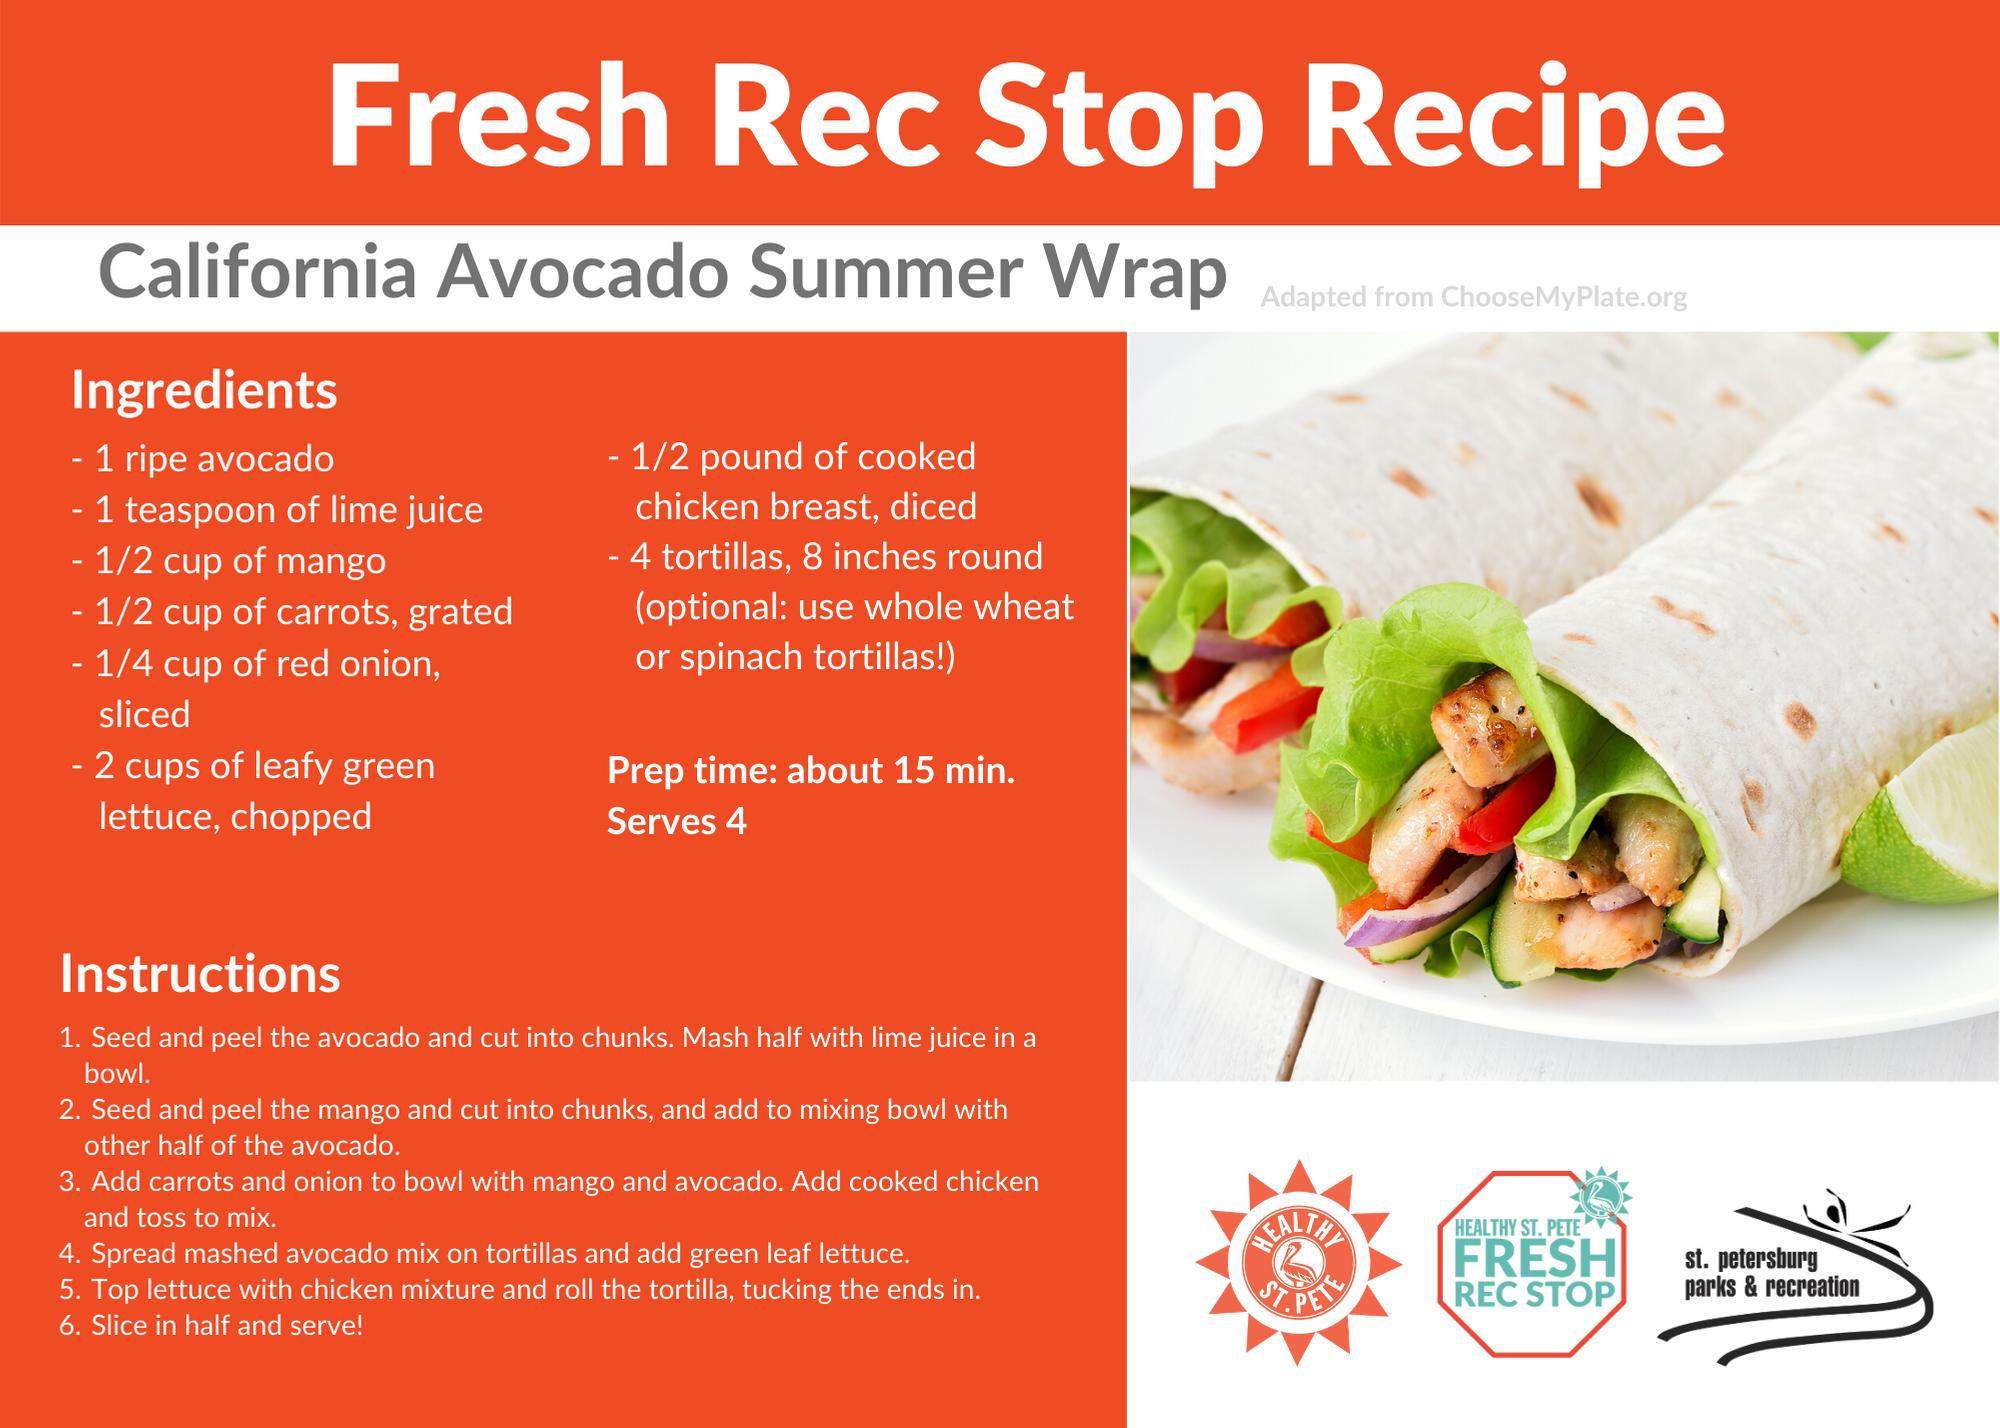 Avocado Summer Wrap recipe